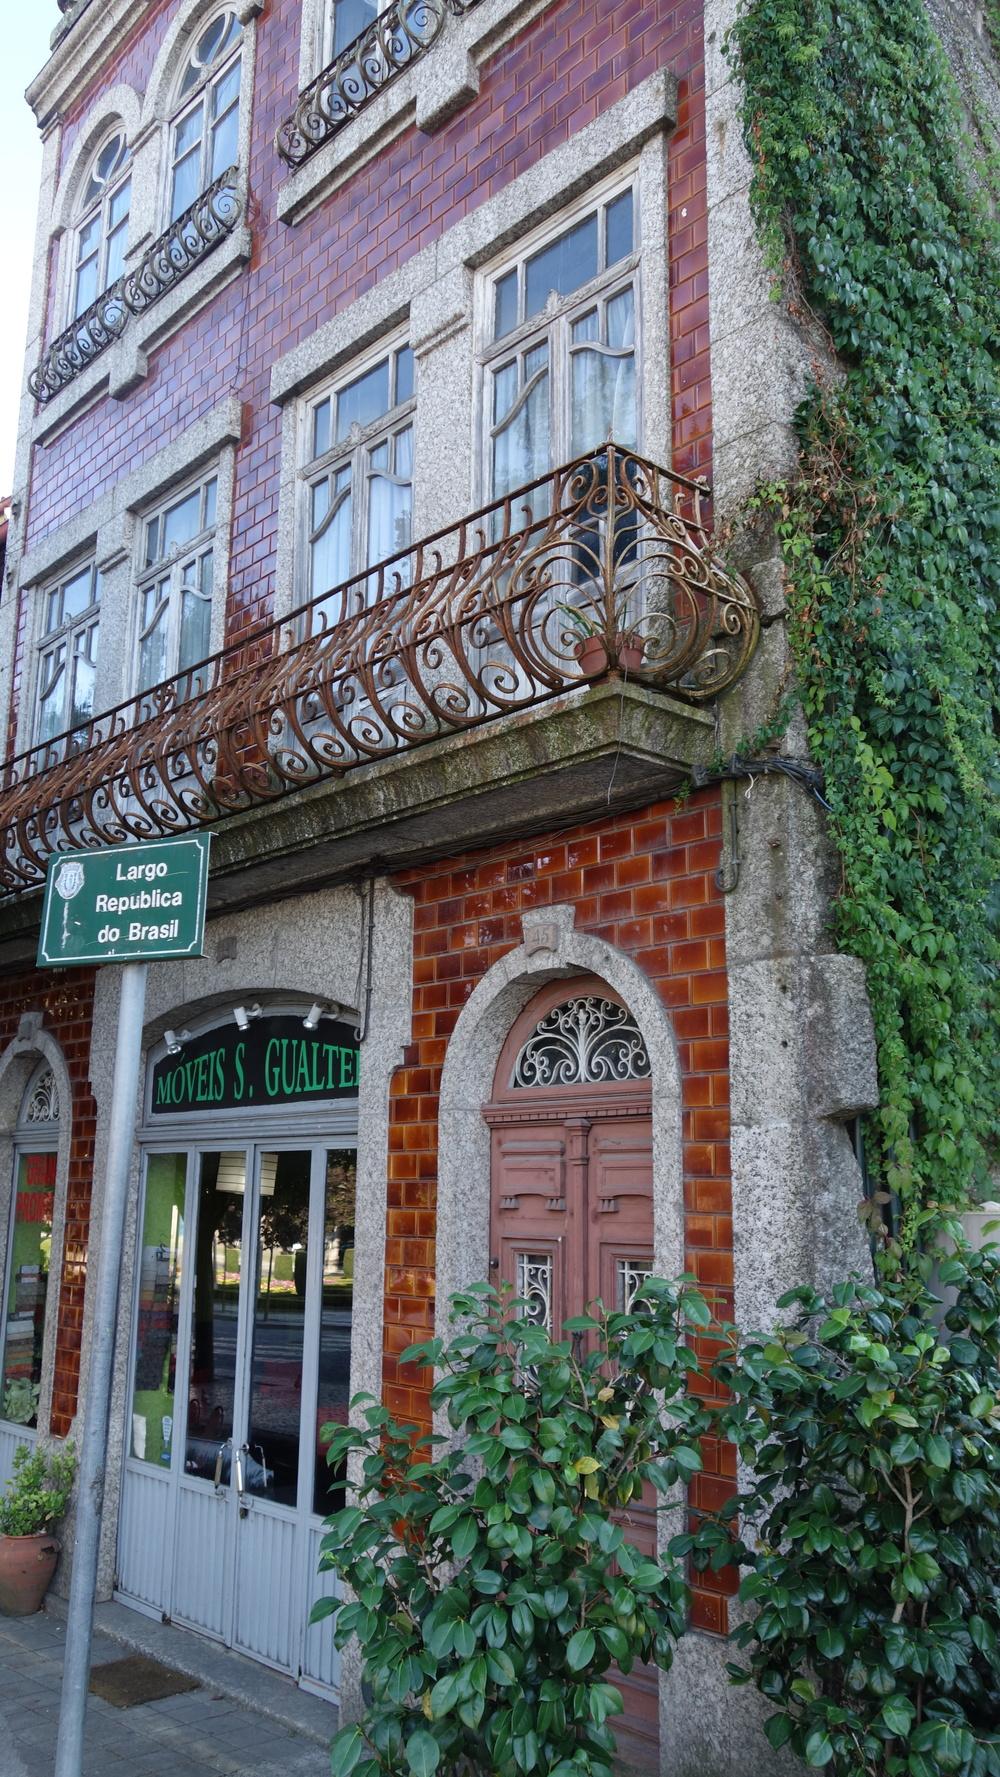 Charming shops in Guimaraes